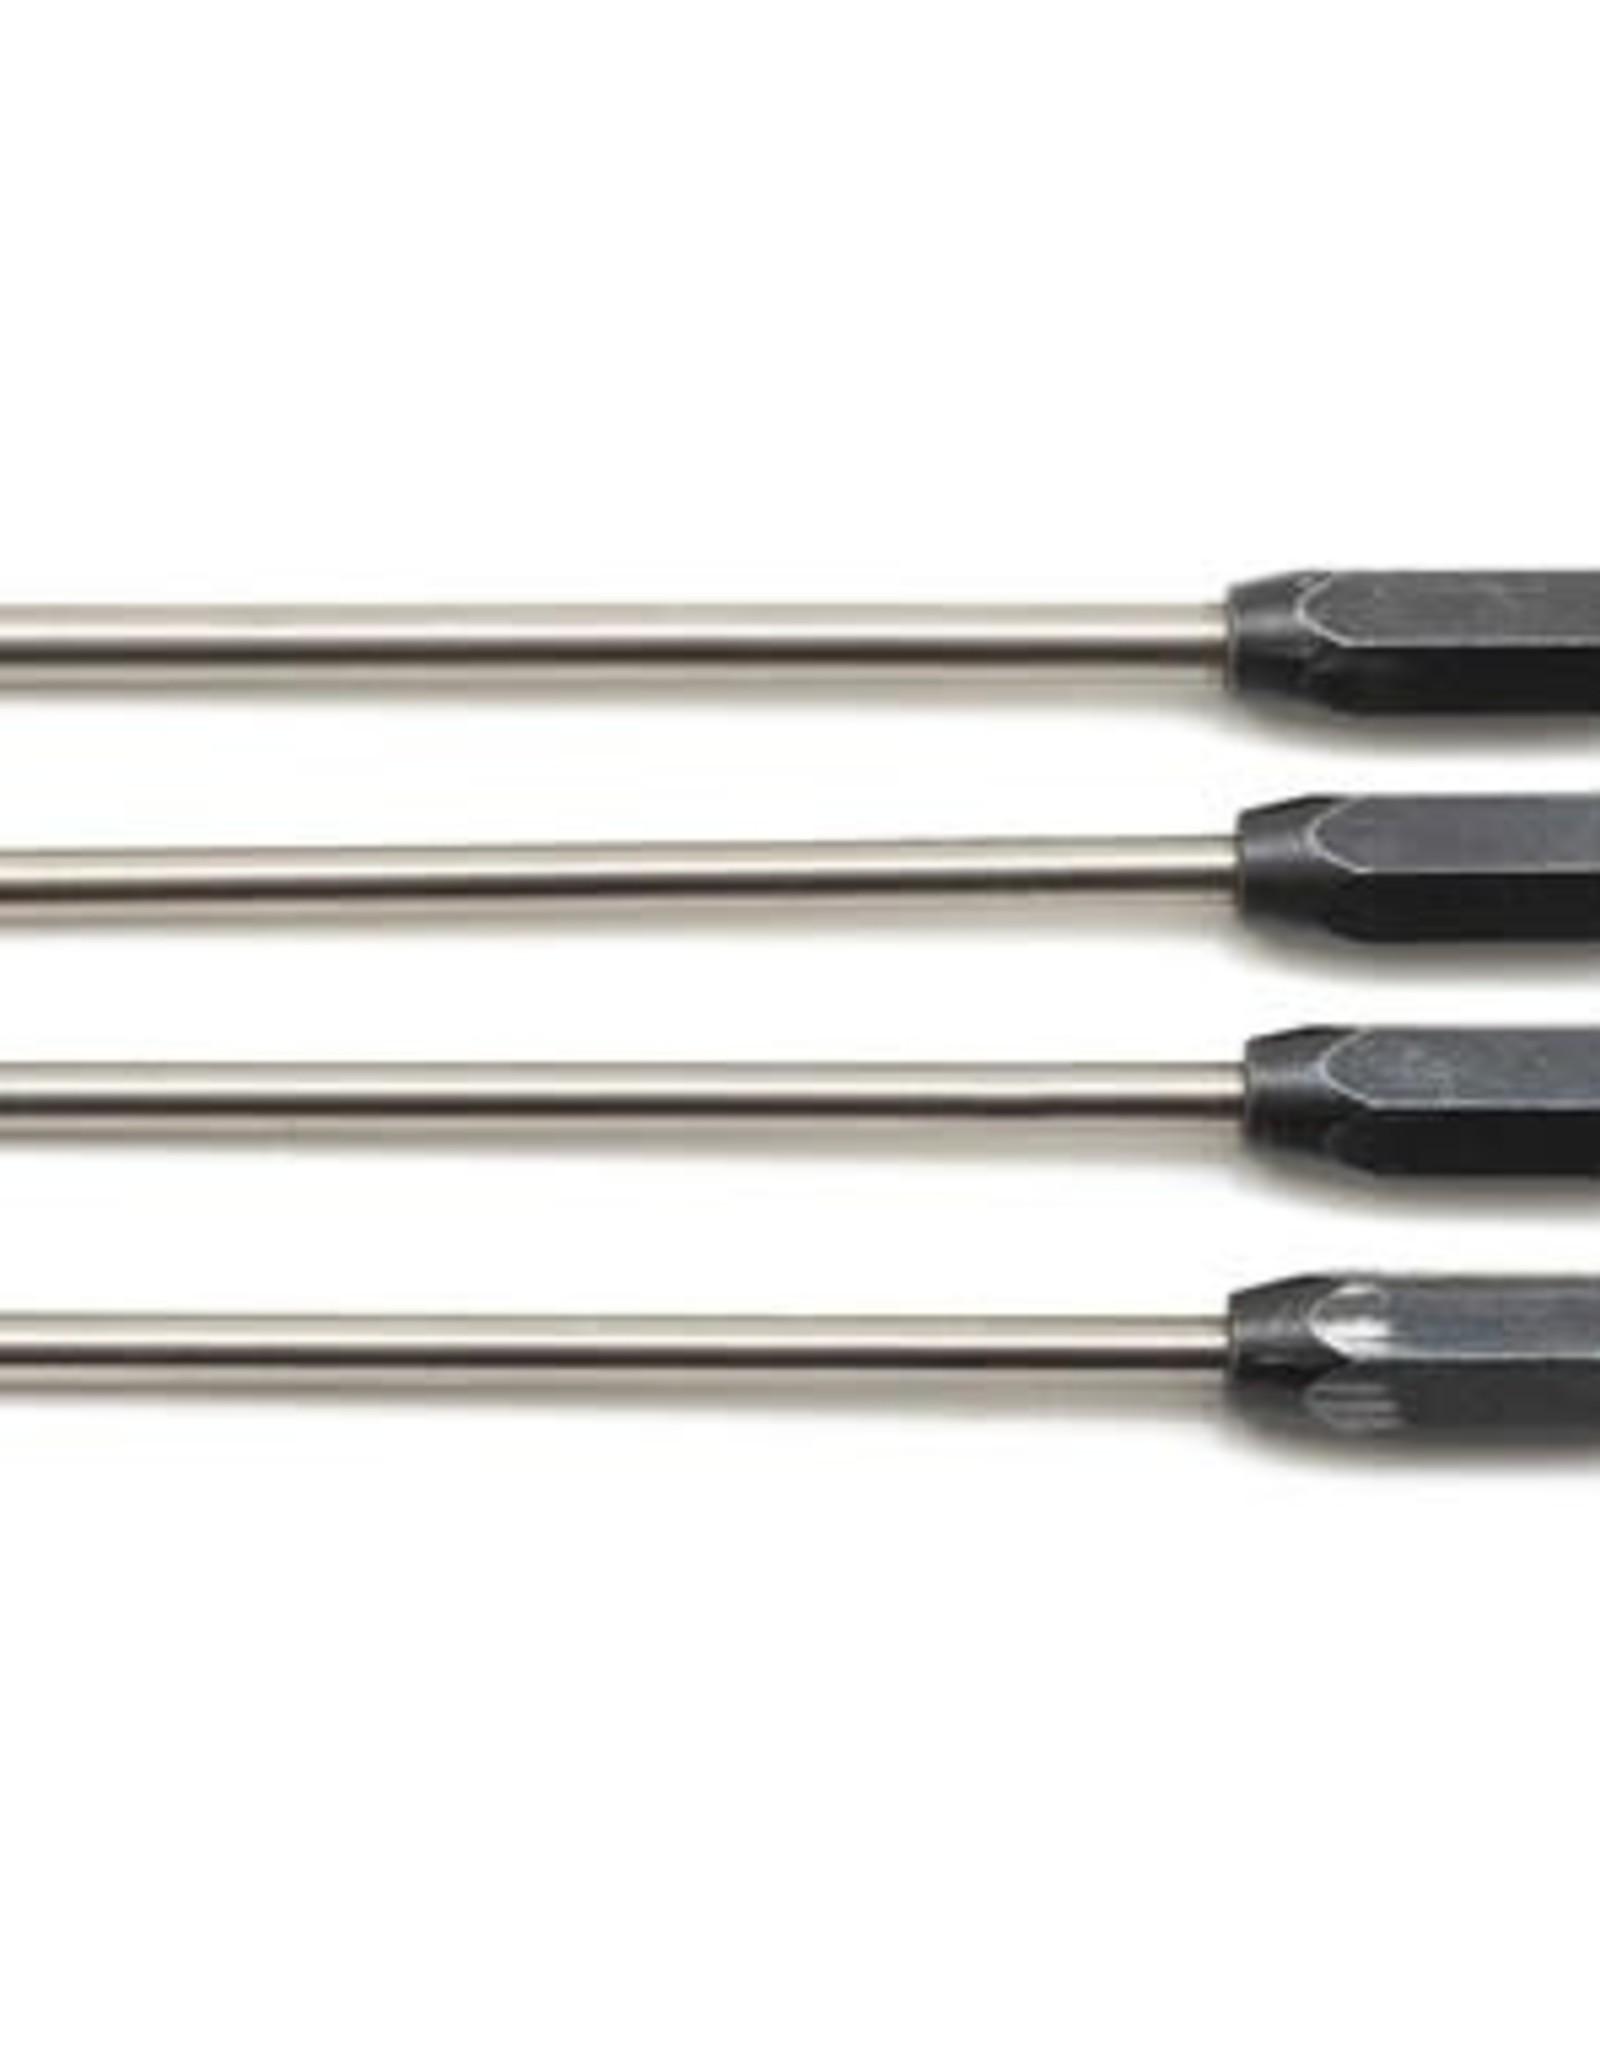 "Protek RC ProTek RC ""TruTorque"" Metric Power Tool Tip Set (4) (1.5, 2.0, 2.5, 3.0mm)"